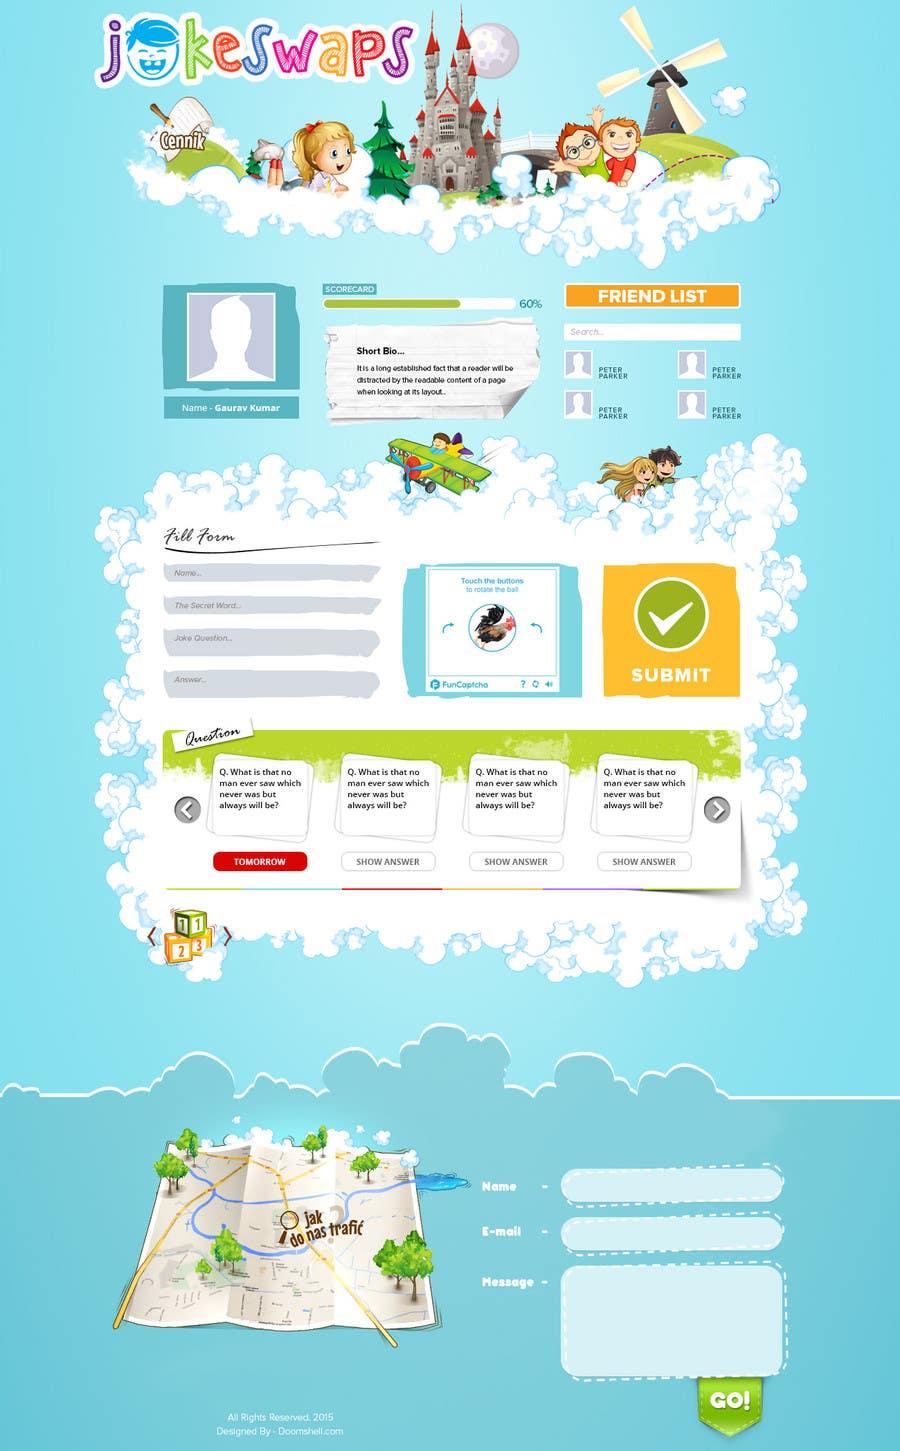 Bài tham dự cuộc thi #12 cho Design a Website Mockup for Kids Social Media site